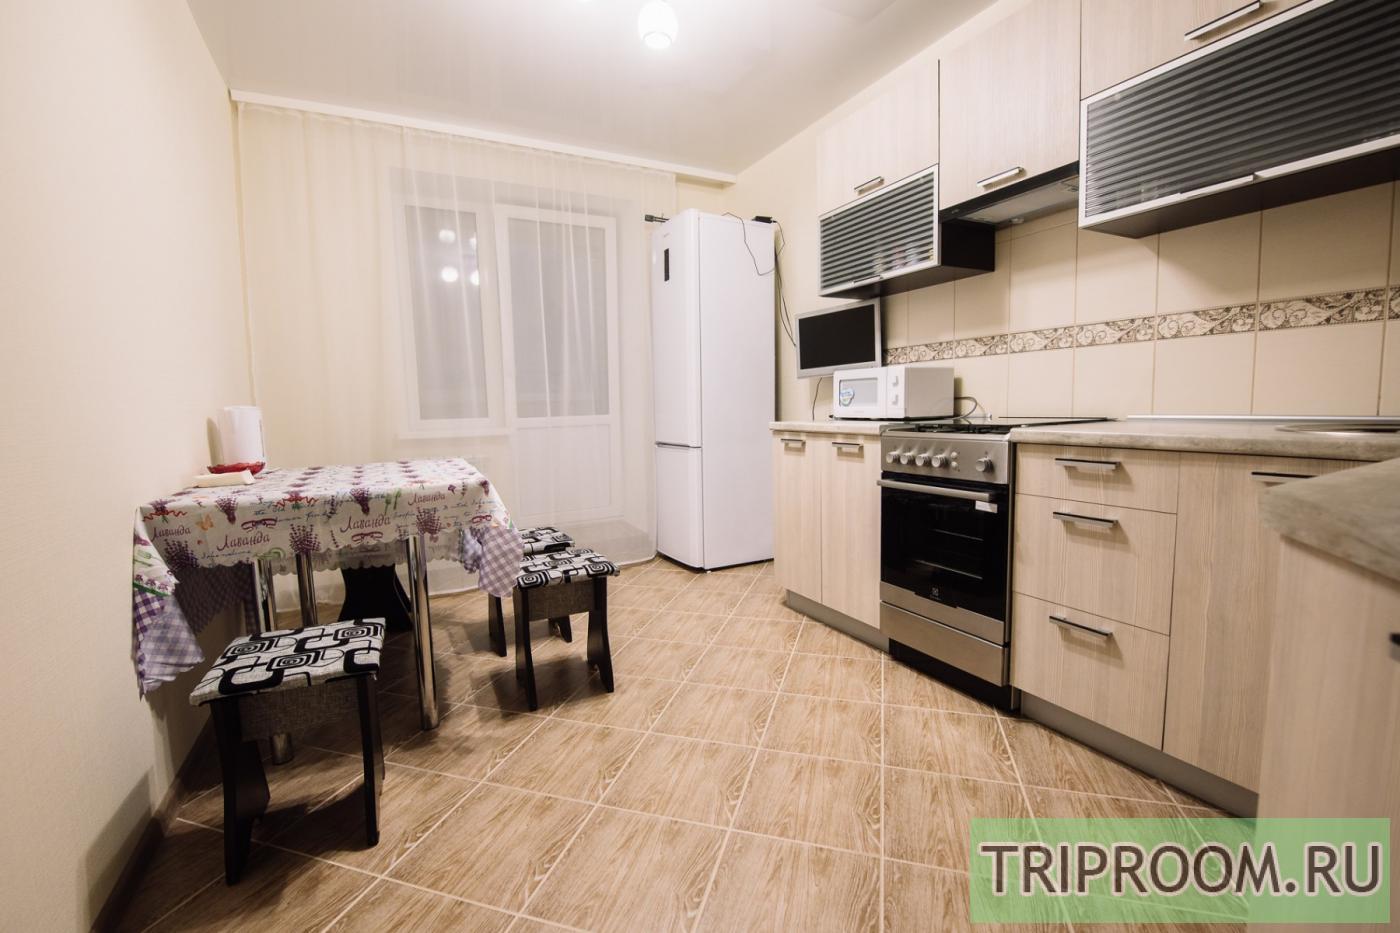 1-комнатная квартира посуточно (вариант № 21616), ул. Нормандия-Неман, фото № 10